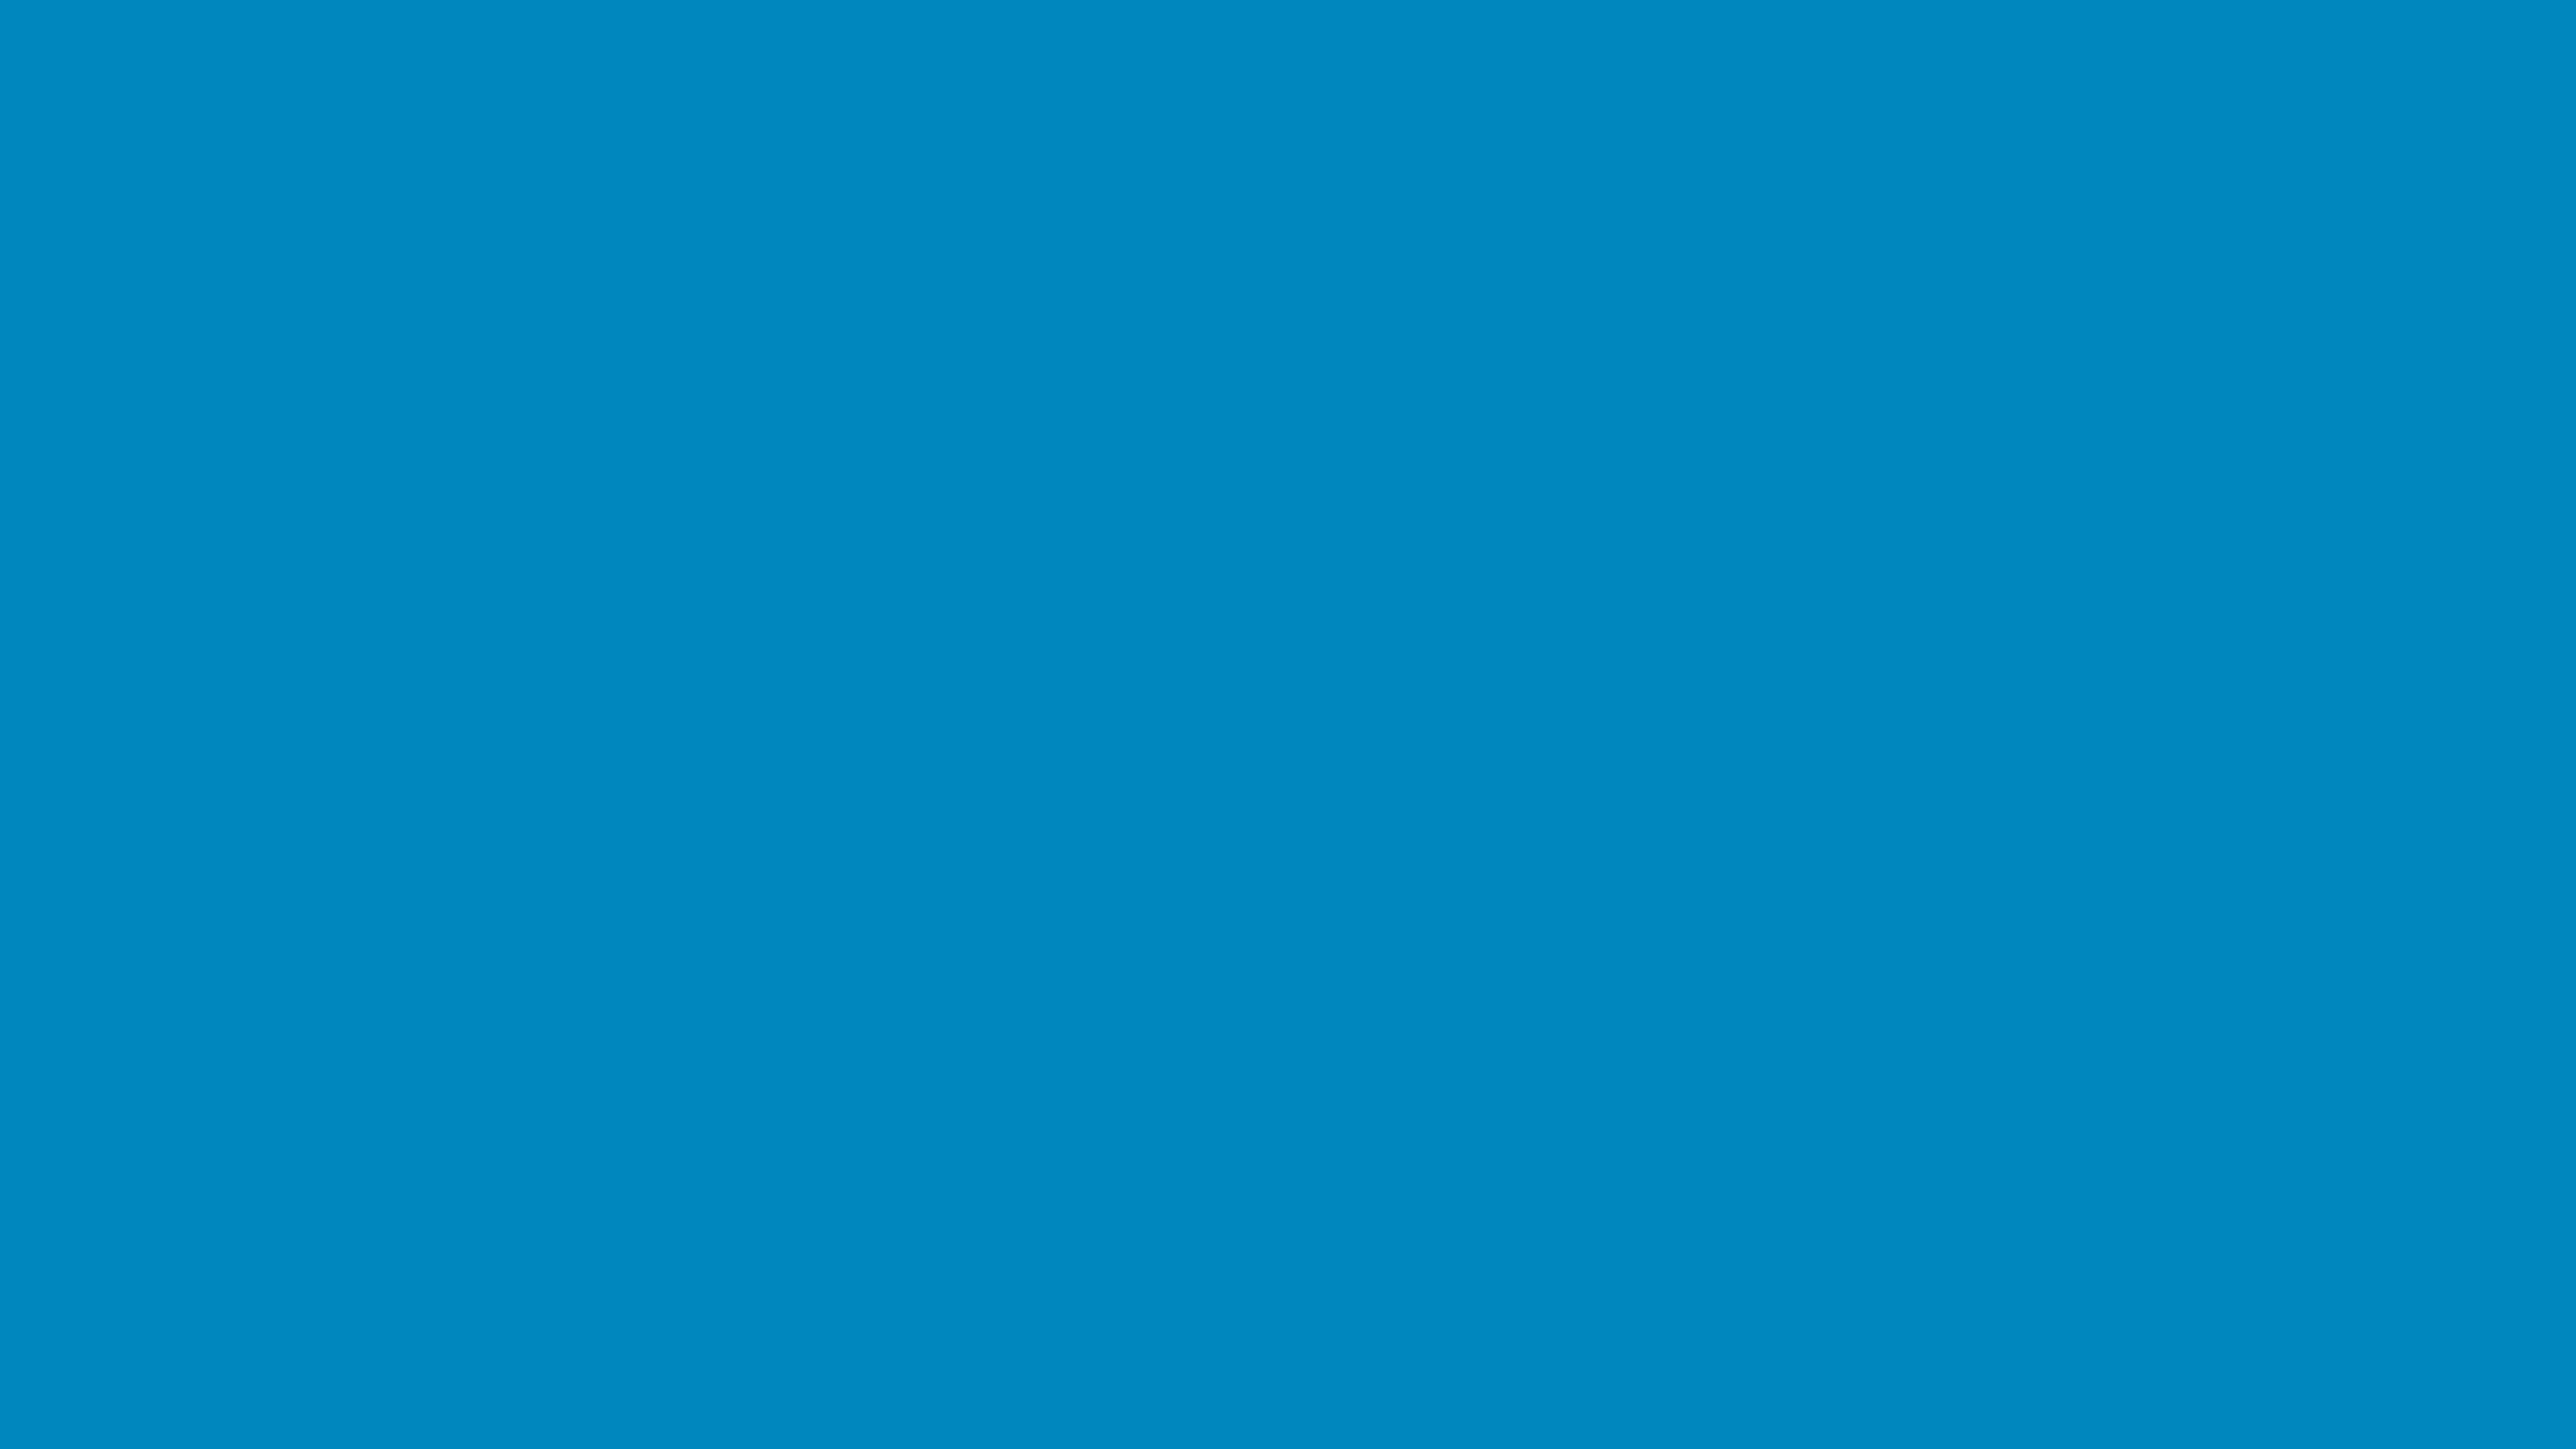 5120x2880 Blue NCS Solid Color Background